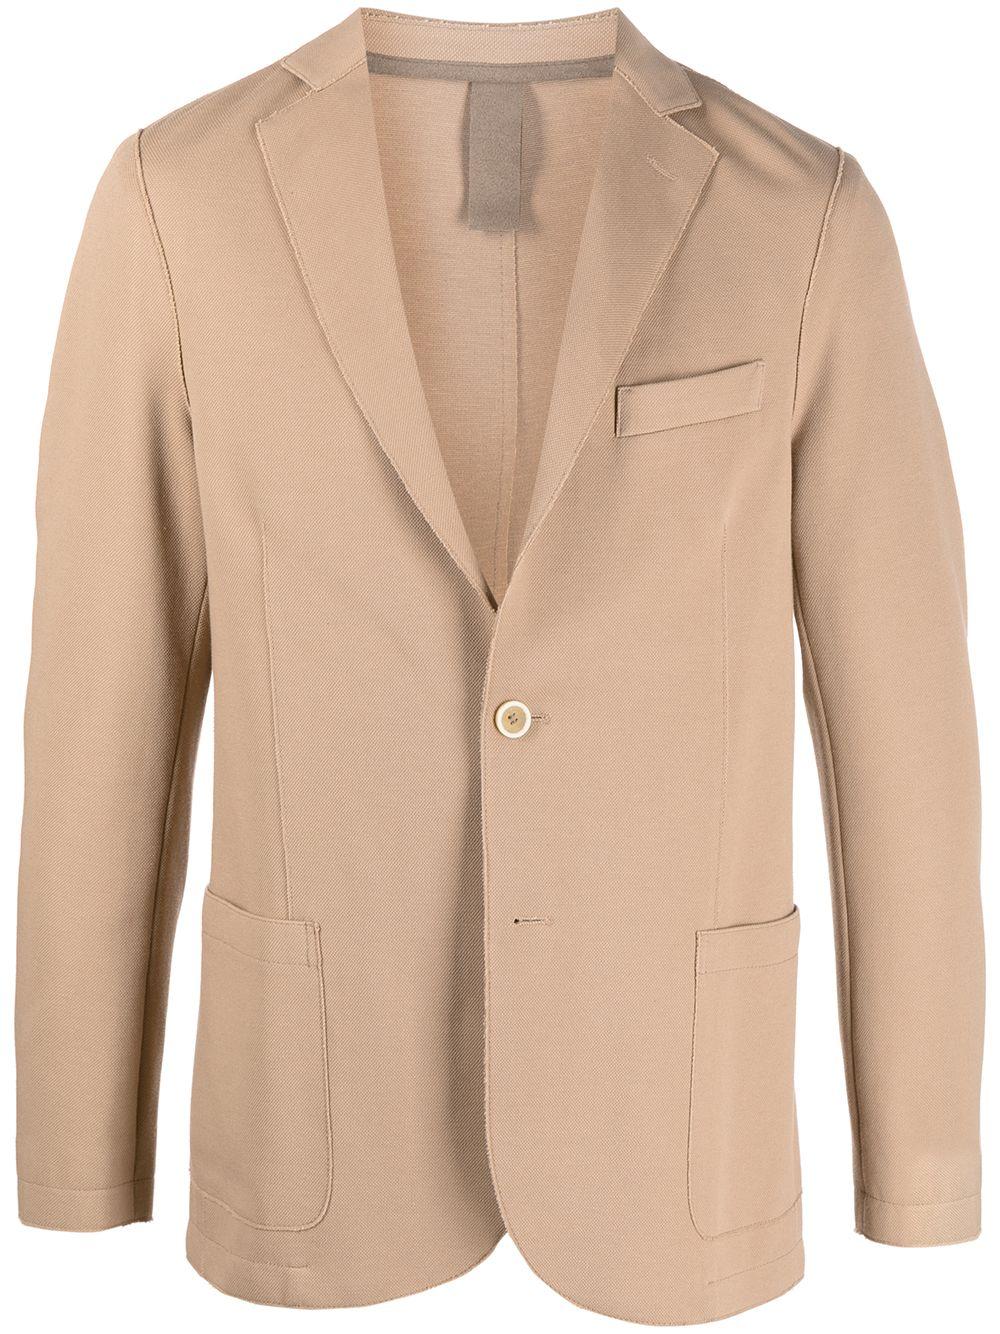 Beige cotton-blend notch-lapel single-breasted blazer  ELEVENTY |  | C70GIAA01-JAC2500104